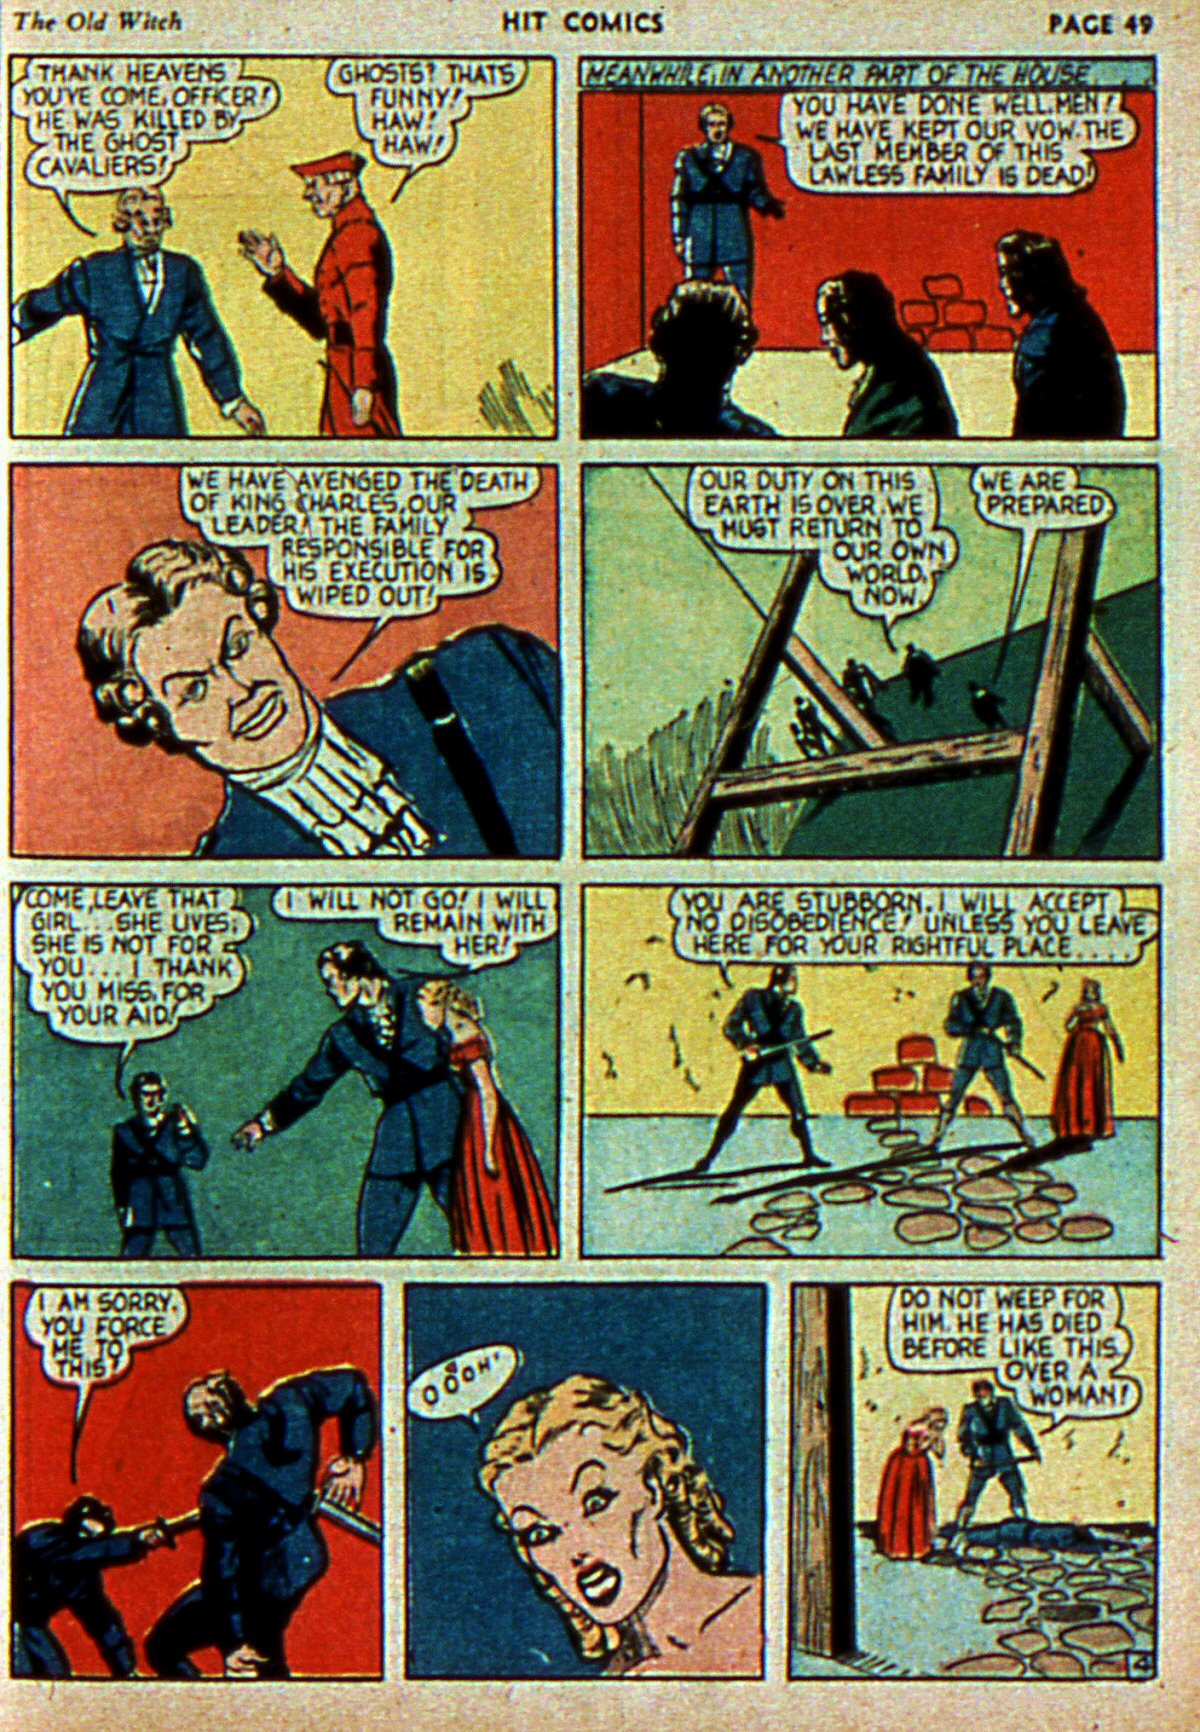 Read online Hit Comics comic -  Issue #3 - 51